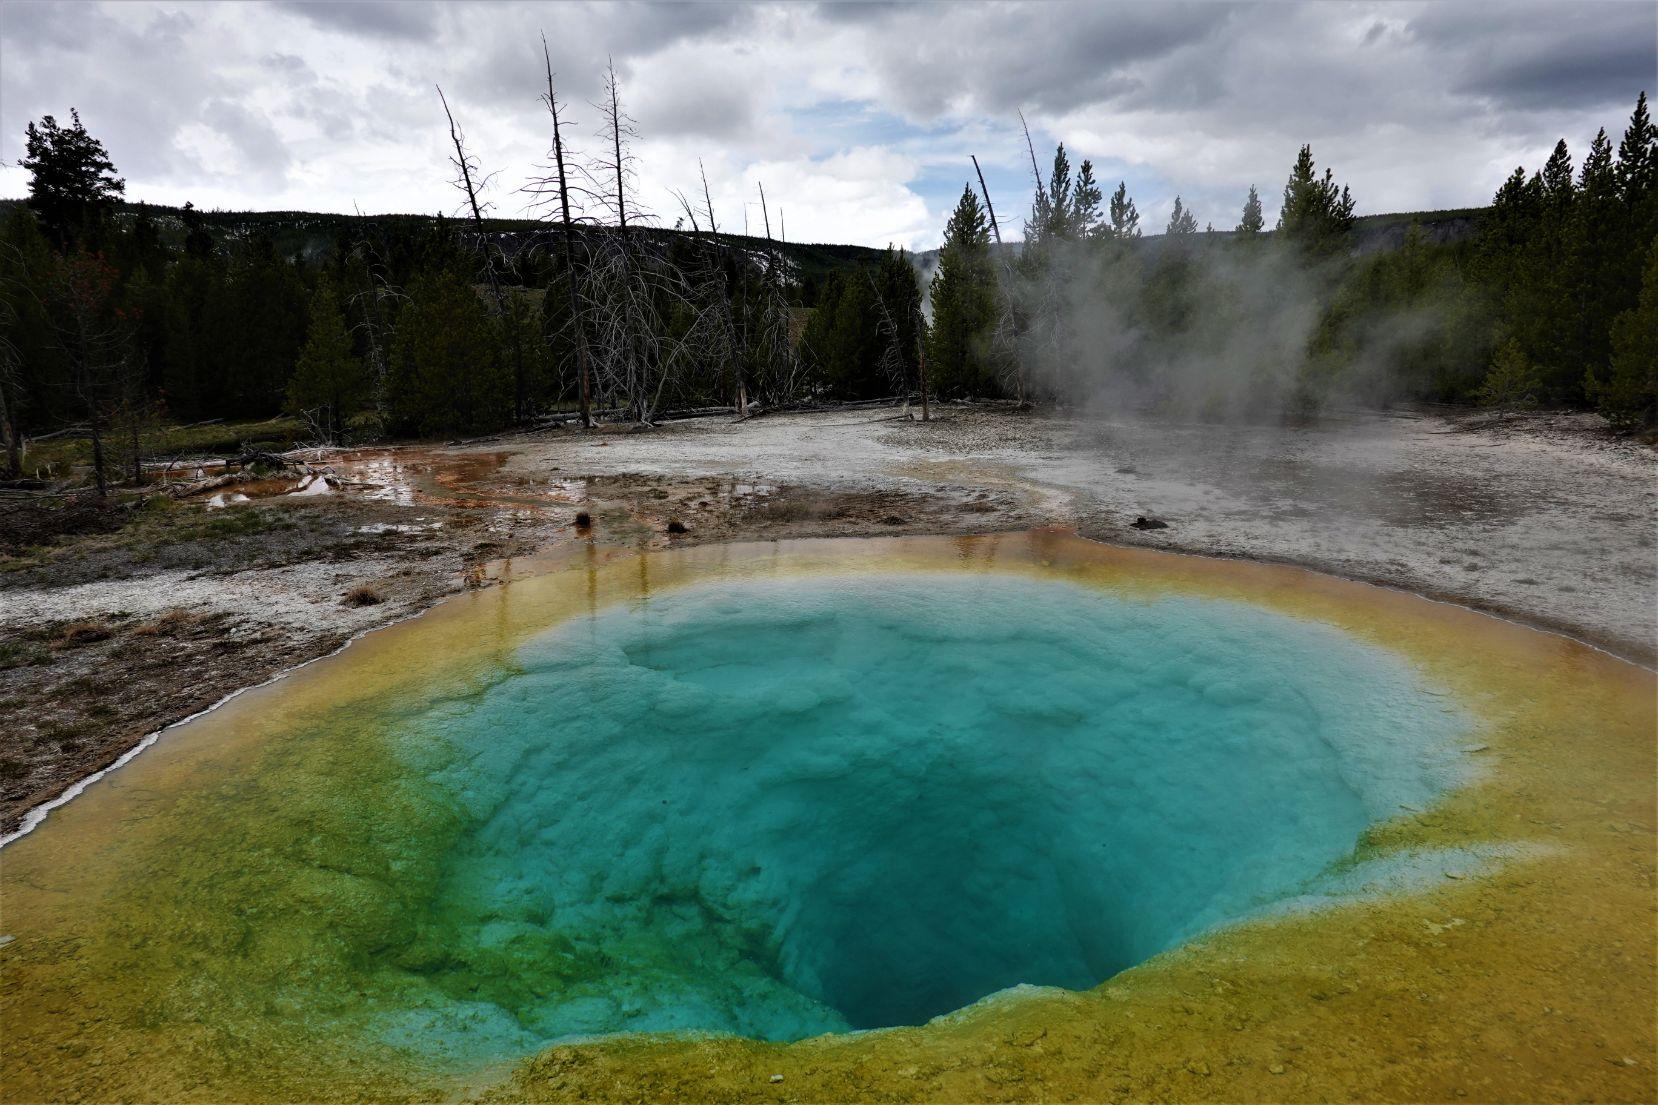 Fantastické barvy v NP Yellowstone